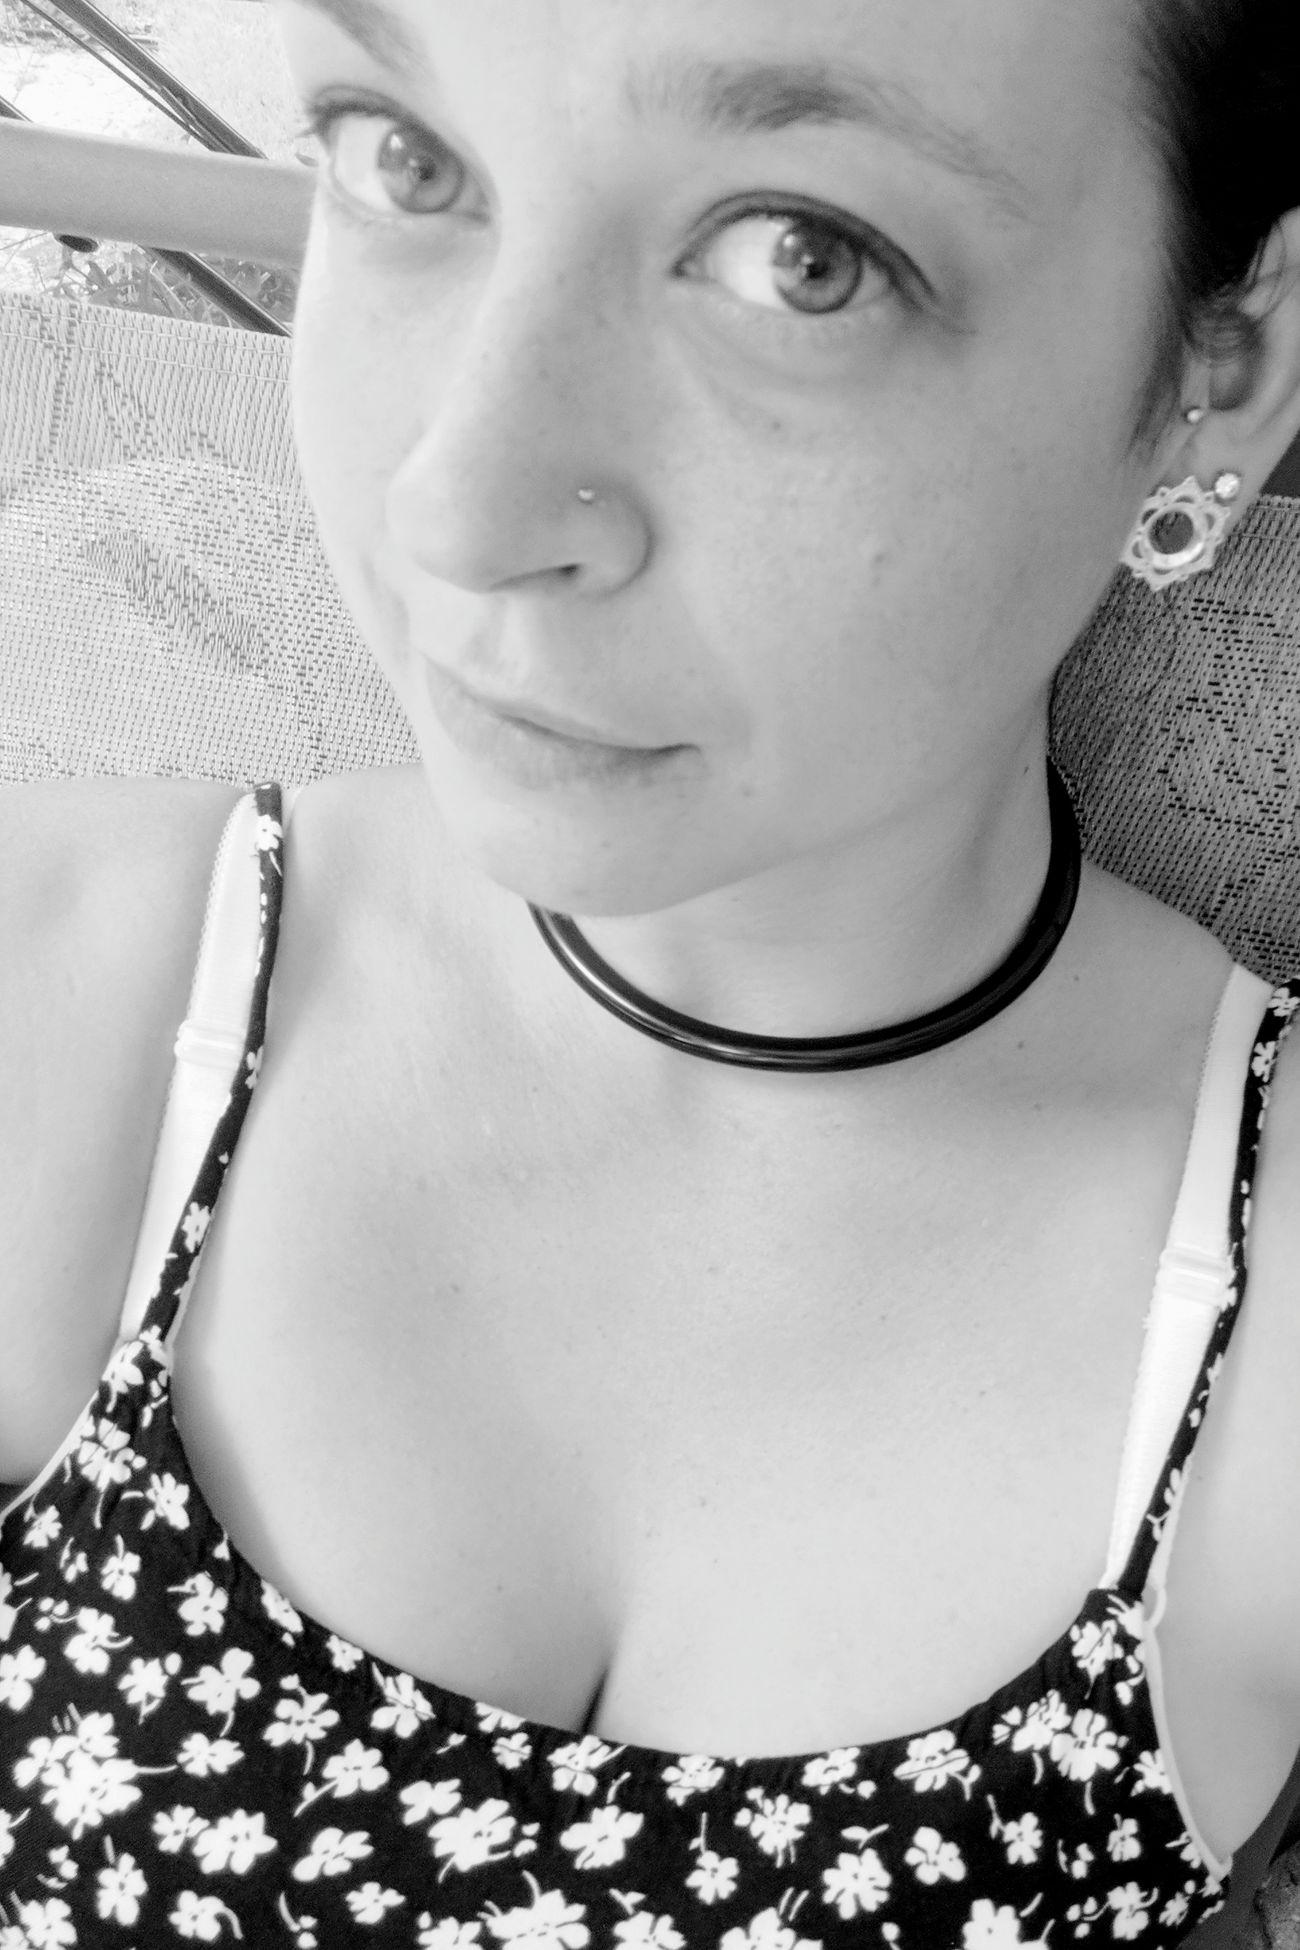 Blackandwhite Selfıe Itsme Close-up Sunnyday